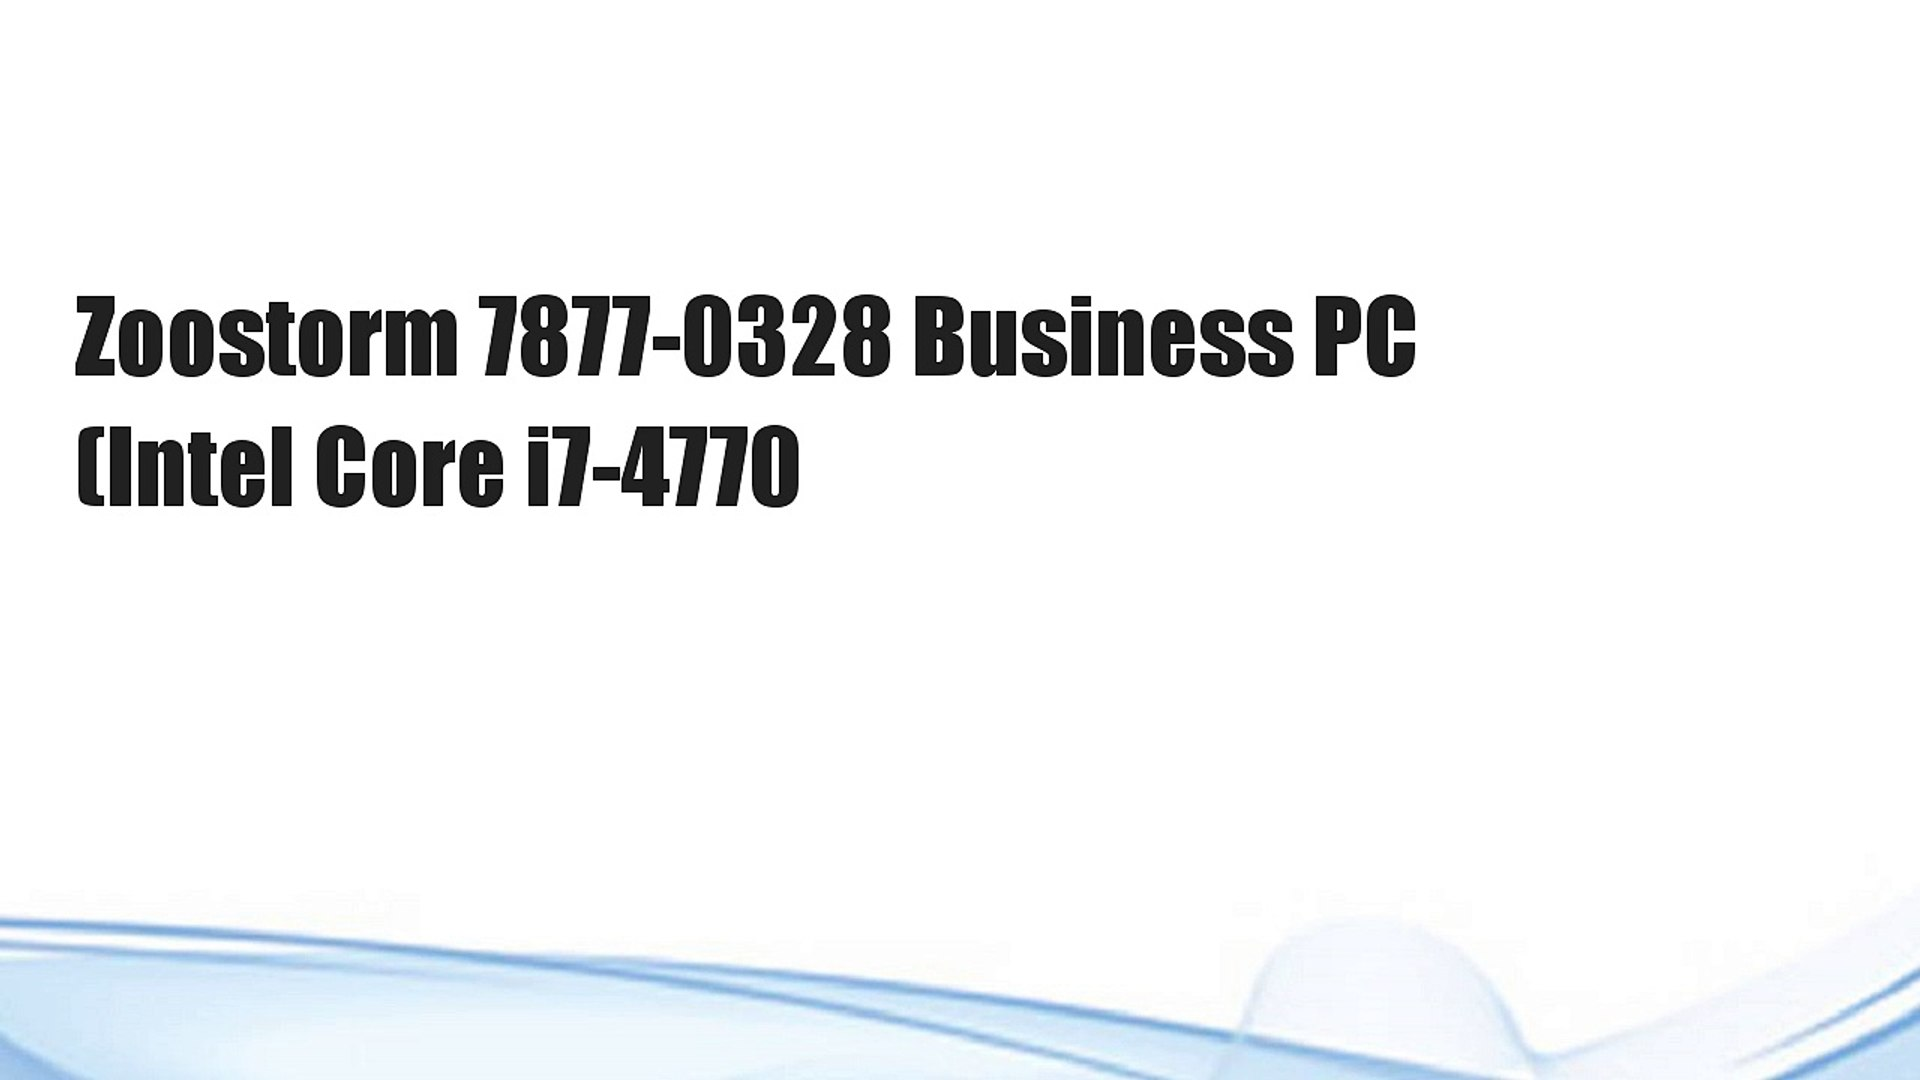 Zoostorm 7877-0328 Business PC (Intel Core i7-4770